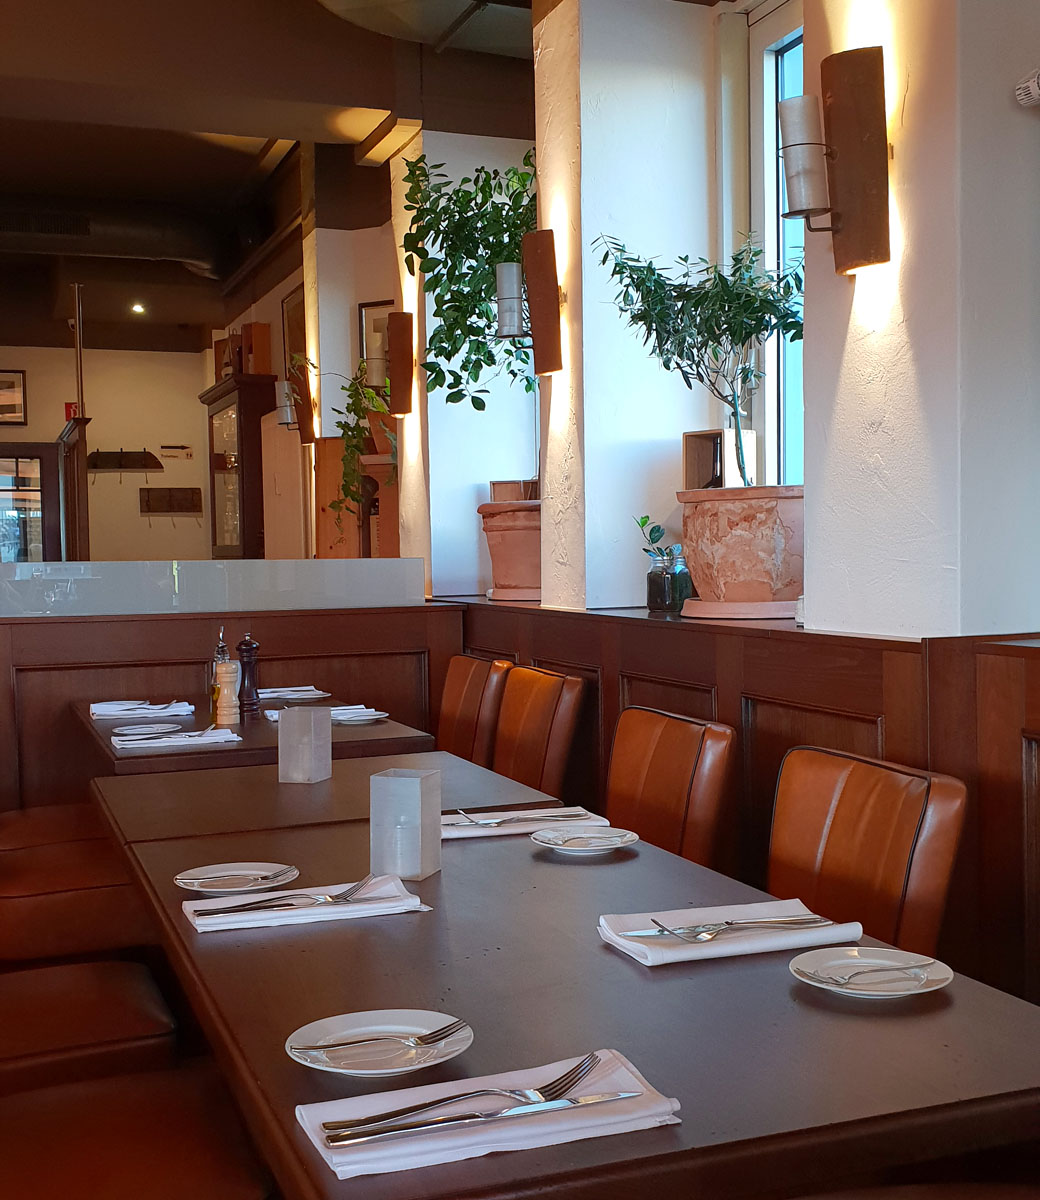 "restaurants-in-kassel-small-konoba-interior-detail ""width ="" 1040 ""height ="" 1200 ""data-wp-pid ="" 8776 ""srcset ="" https://www.nicolos-reiseblog.de/wp- content / uploads / 2018/09 / restaurants-in-kassel-small-konoba-interior-detail.jpg 1040w, https://www.nicolos-reiseblog.de/wp-content/uploads/2018/09/restaurants-in -kassel-small-konoba-interior-detail-260x300.jpg 260w, https://www.nicolos-reiseblog.de/wp-content/uploads/2018/09/restaurants-in-kassel-kleine-konoba-innen- detail-887x1024.jpg 887w, https://www.nicolos-reiseblog.de/wp-content/uploads/2018/09/restaurants-in-kassel-kleine-konoba-innen-detail-800x923.jpg 800w ""maten = ""(max. breedte: 1040 px) 100 vw, 1040 px"" /></p data-recalc-dims="